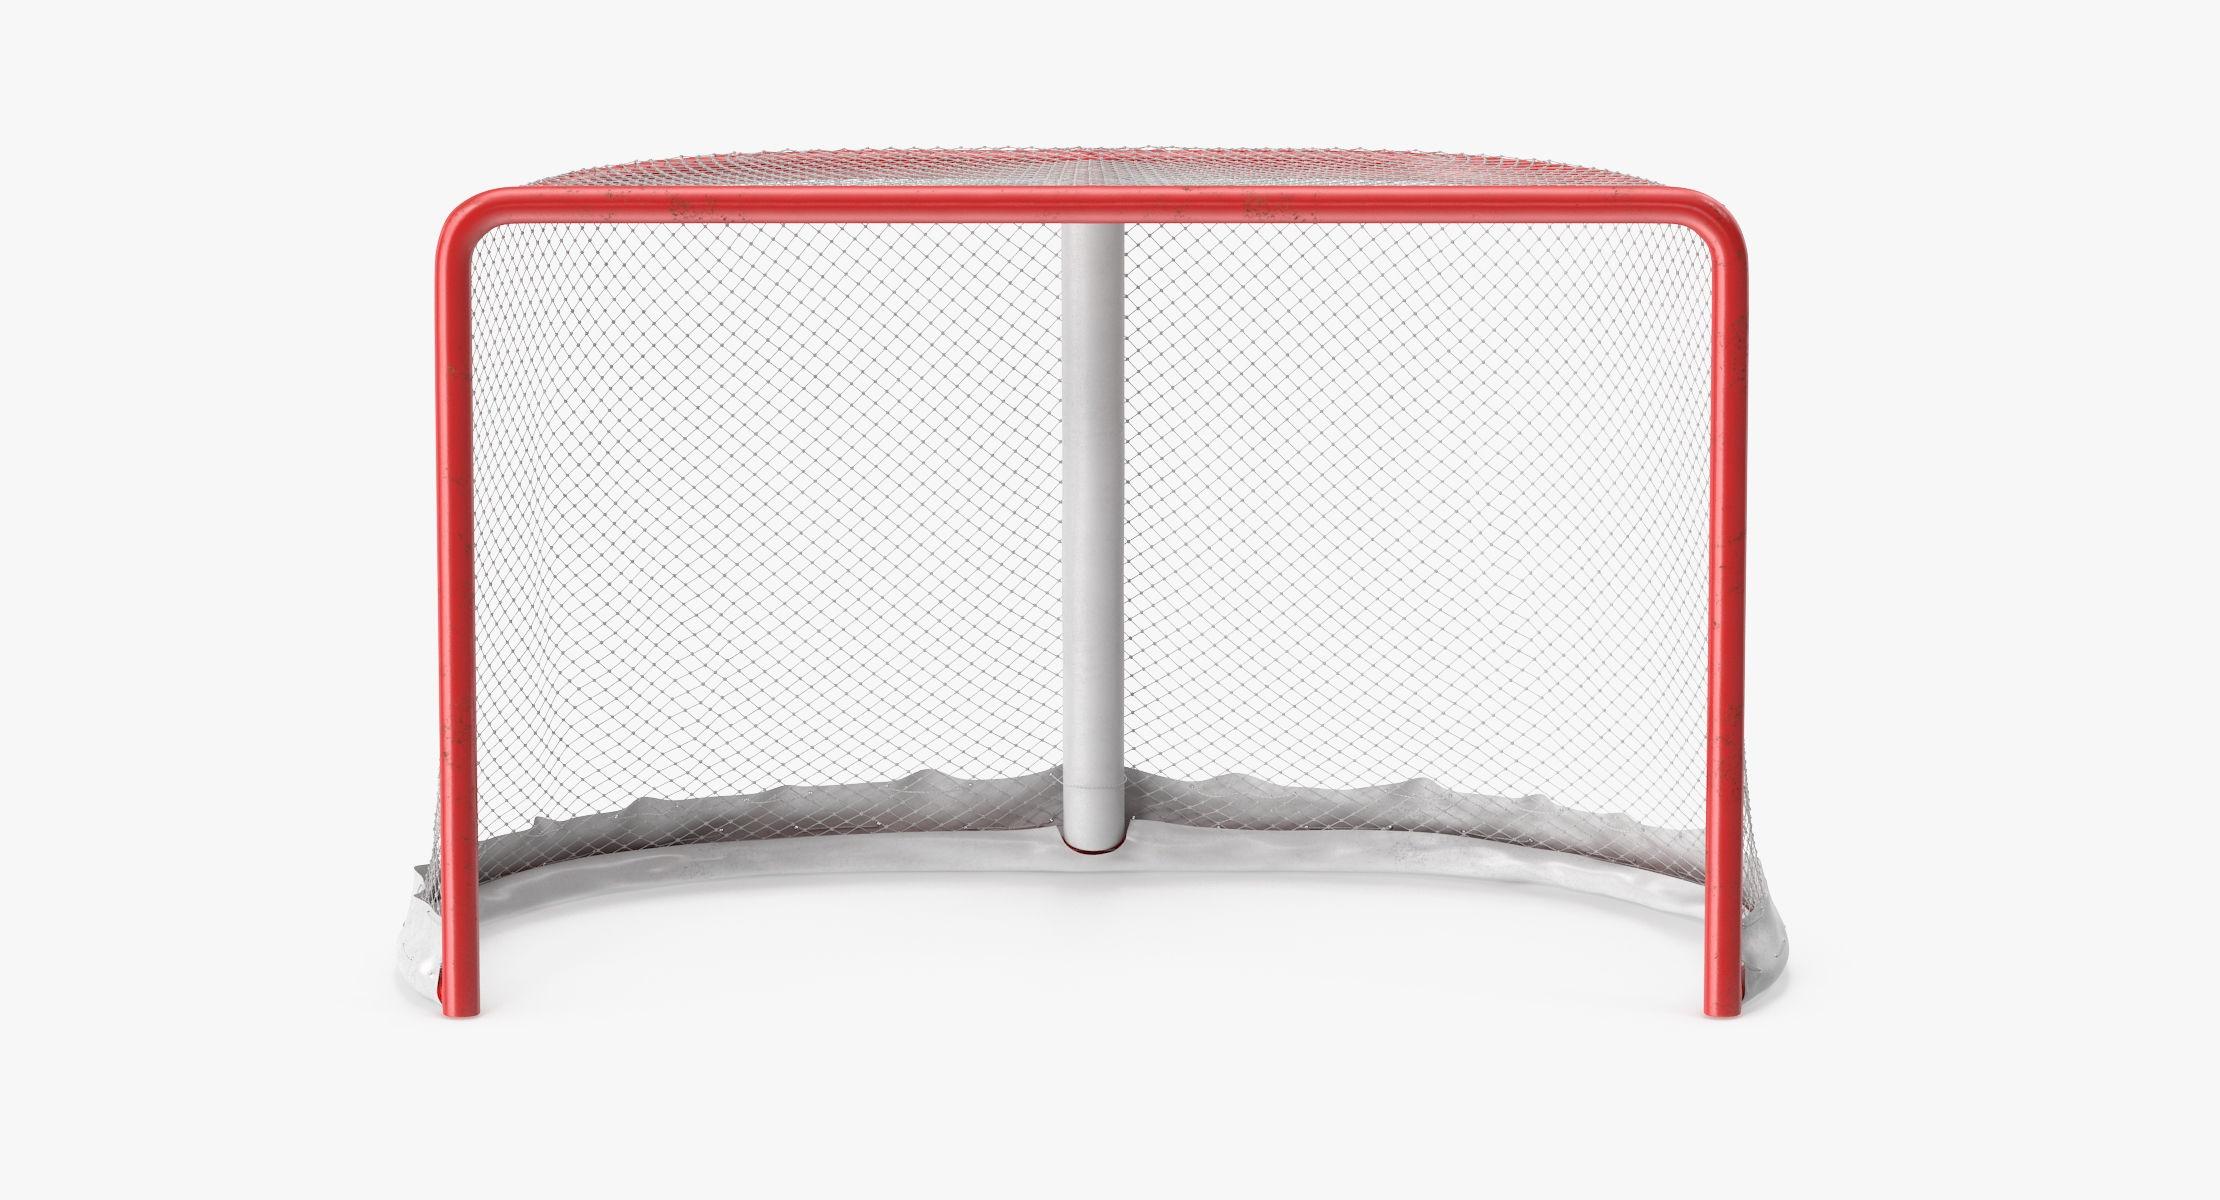 Hockey Goal - reel 1